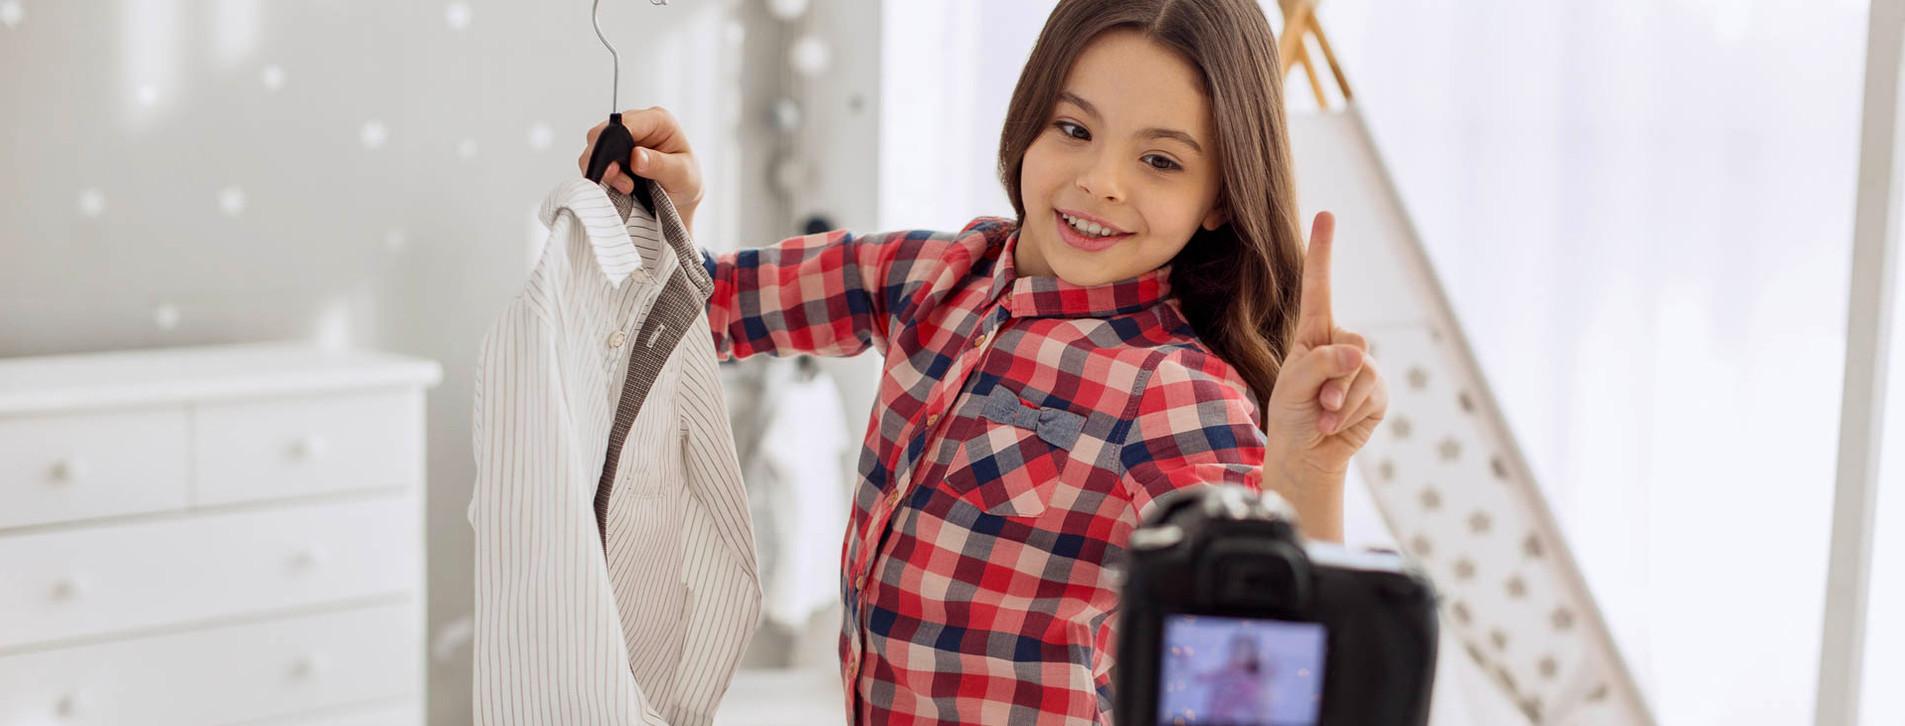 Фото - Детский мастер-класс YouTube-блогера